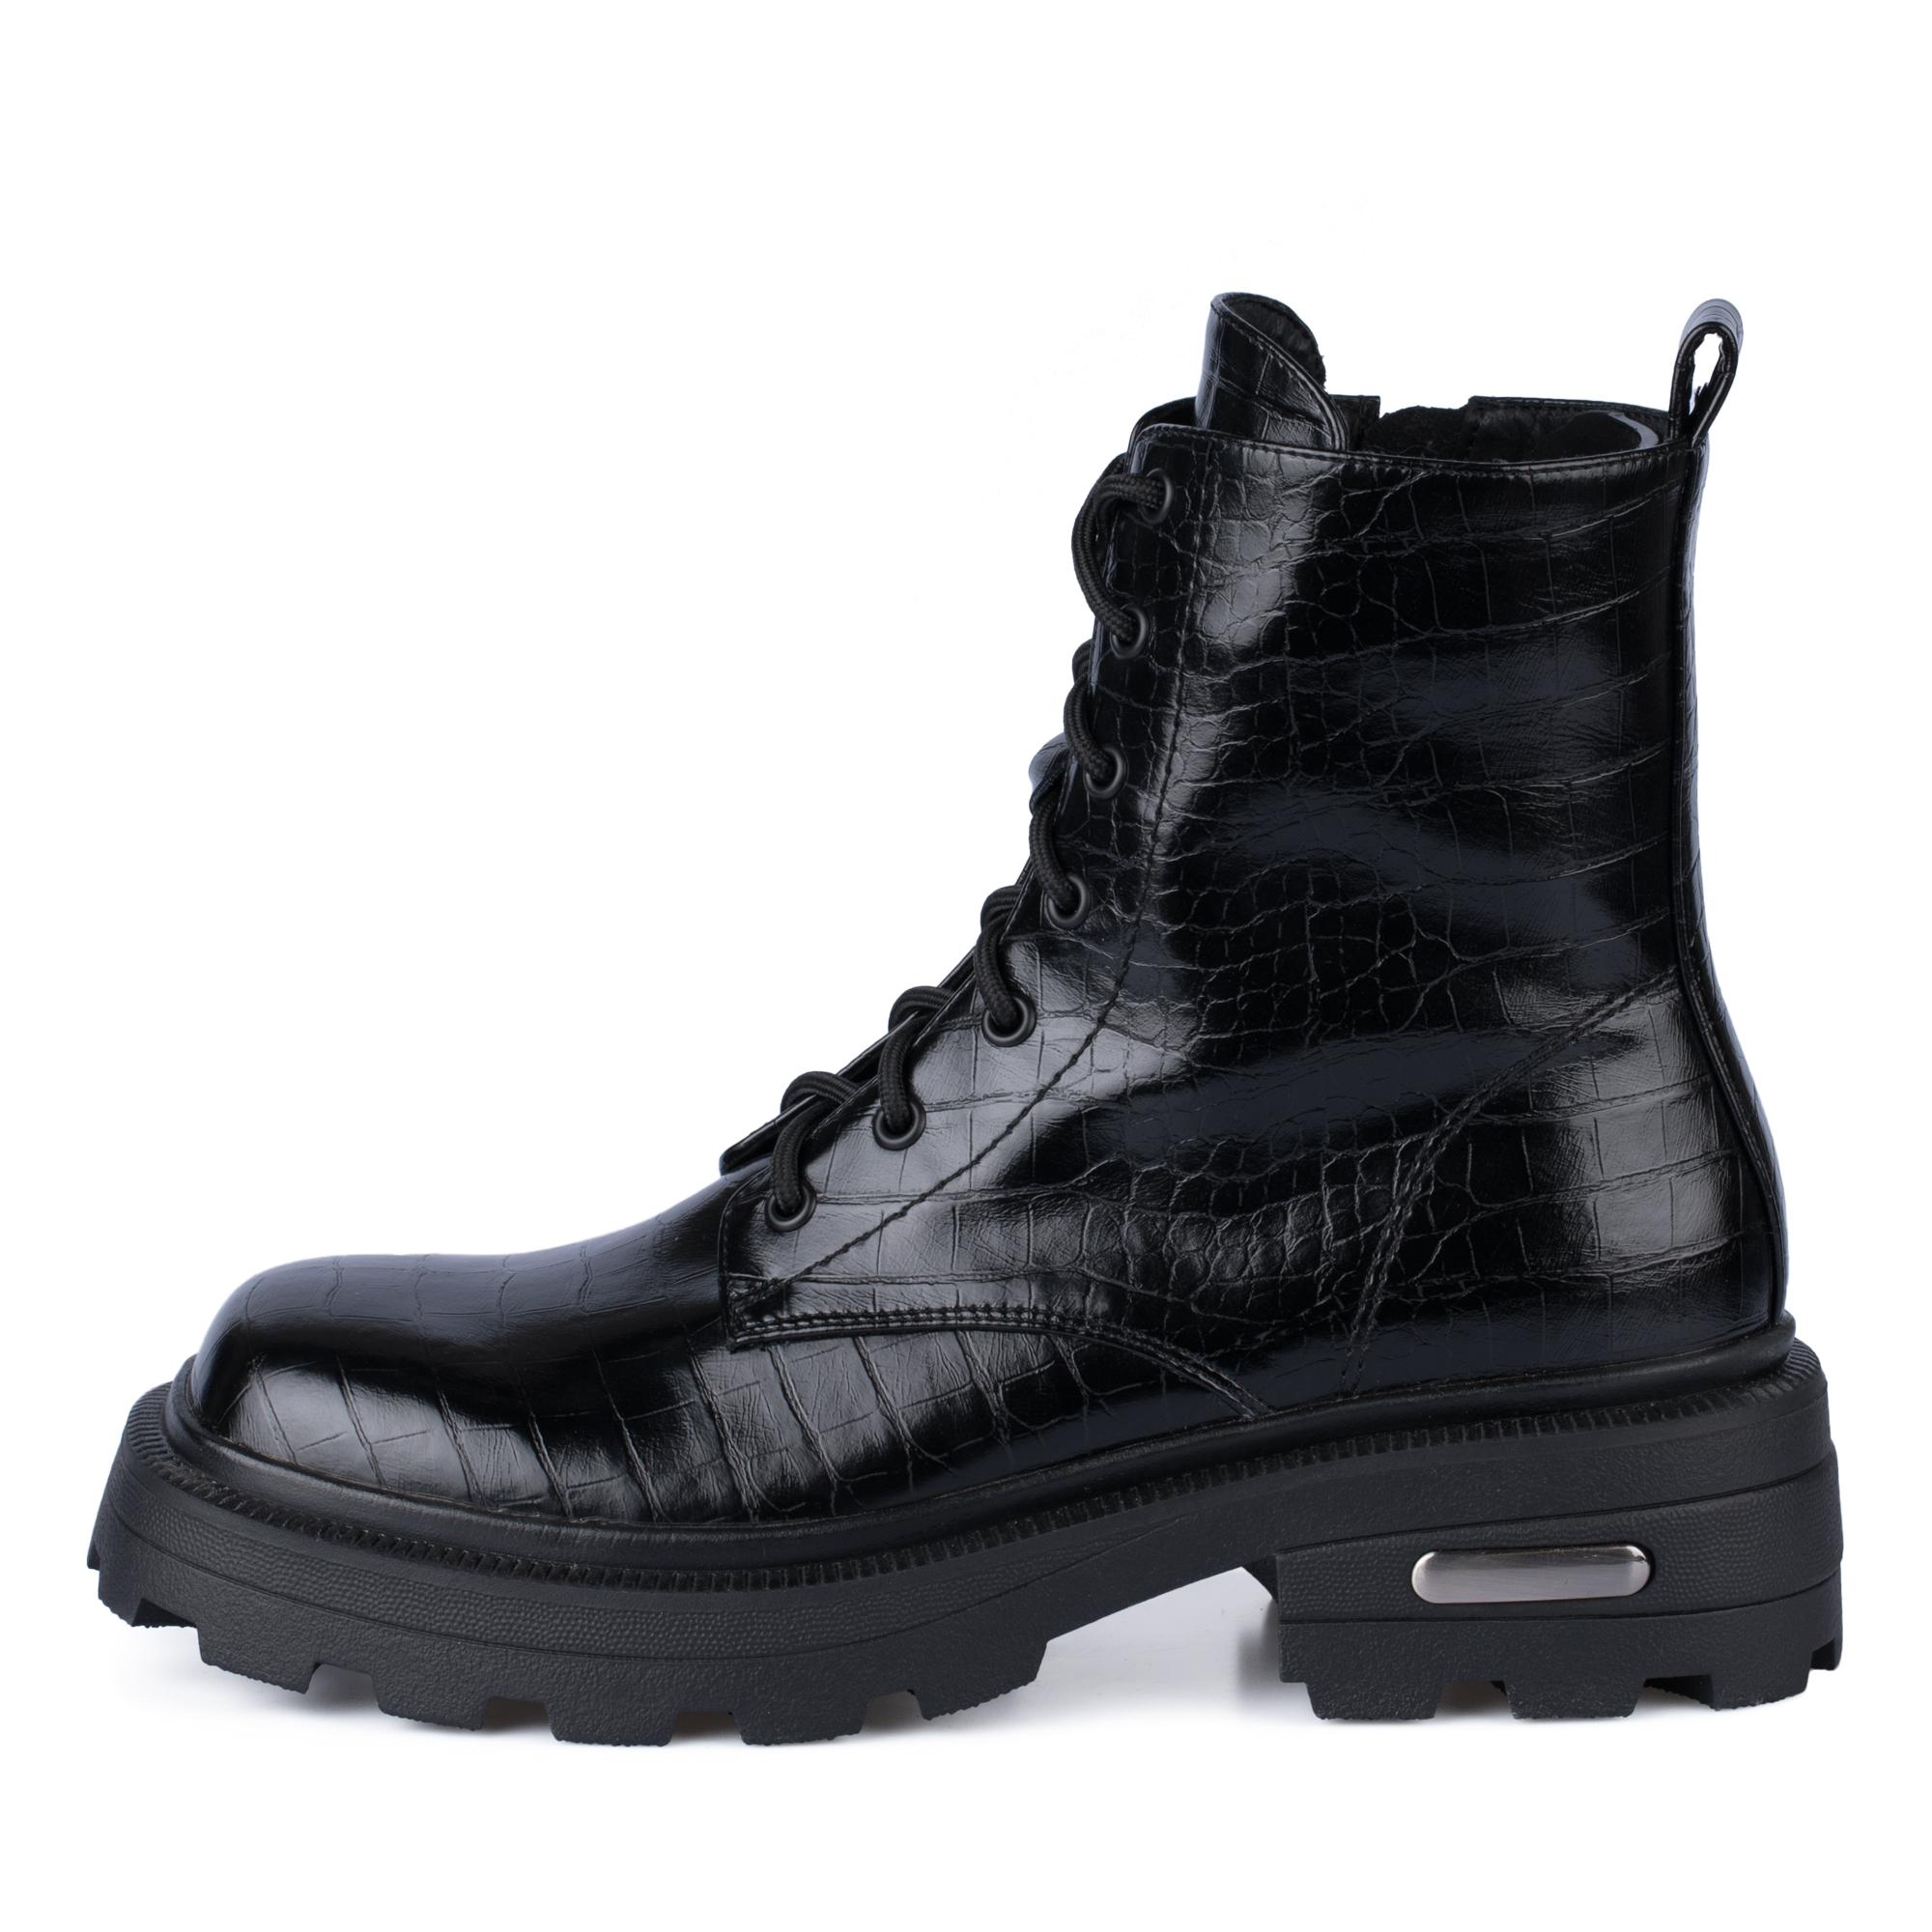 Ботинки Thomas Munz 094-064A-2602